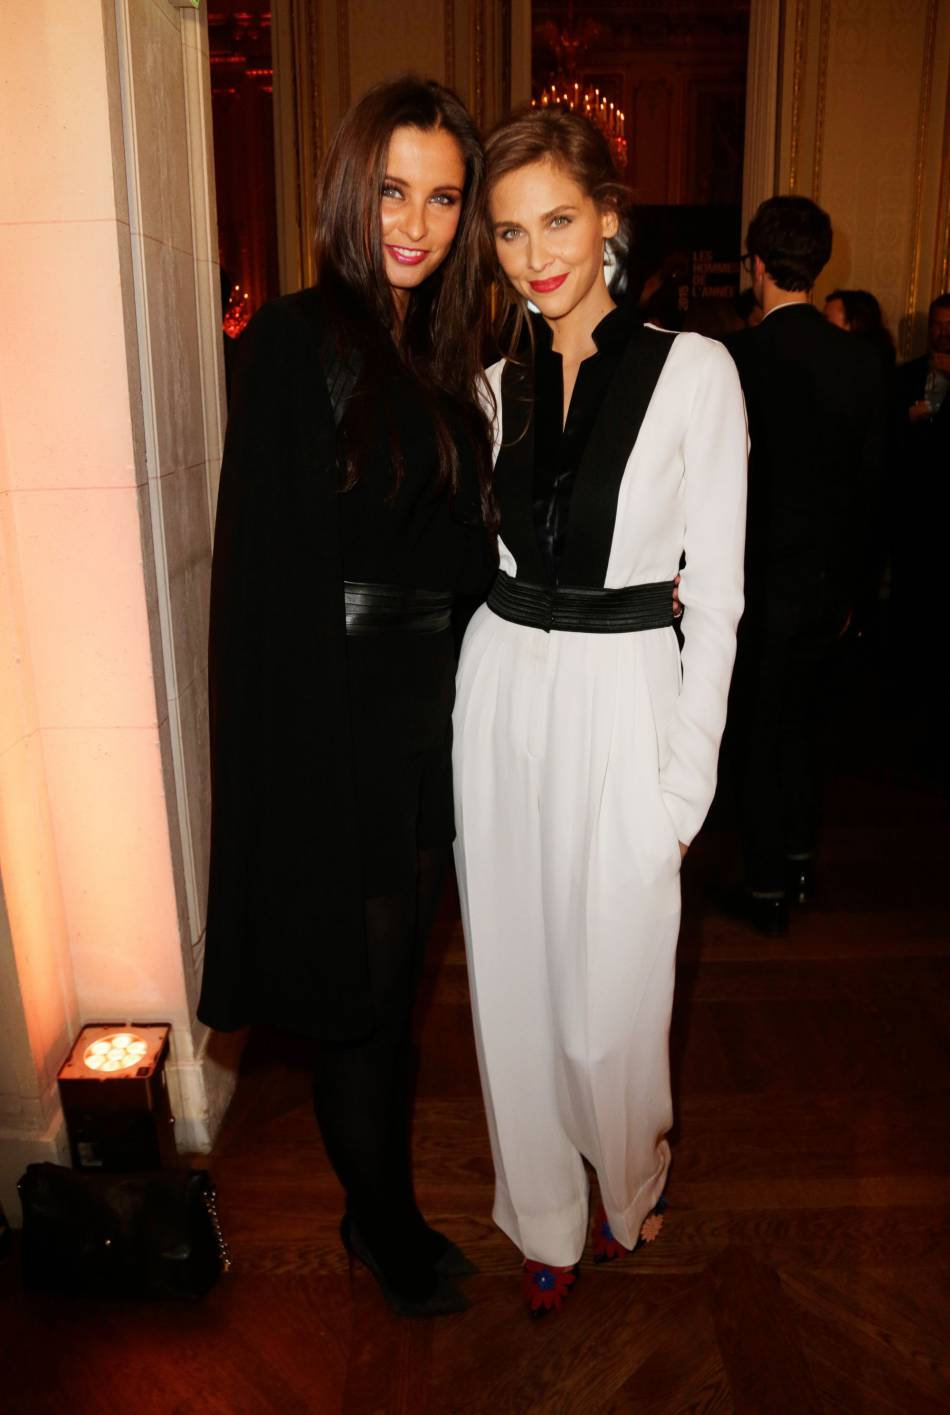 Malika Ménard et Ophélie Meunier, un duo black & white sexy à souhait.